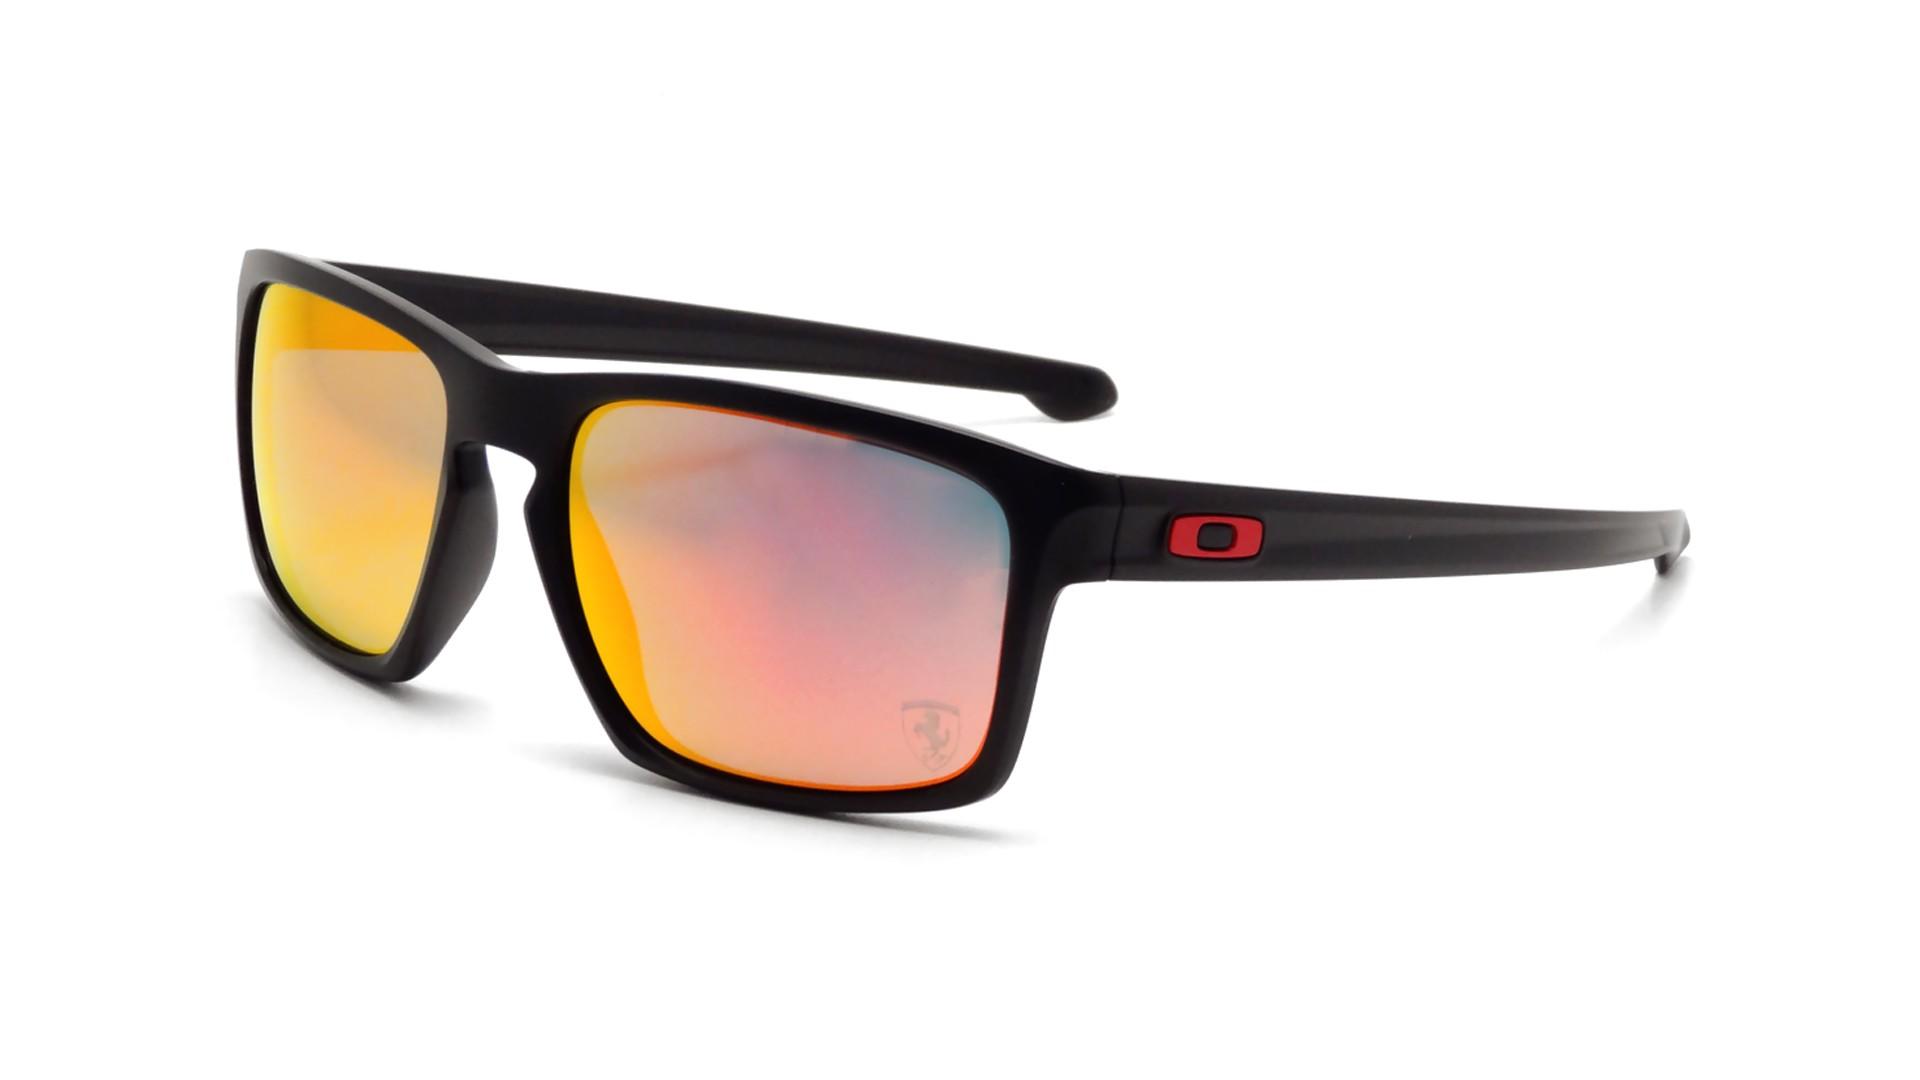 black and yellow oakley sunglasses 194m  Oakley Sliver Black Matte OO9262 12 57-18 99,92